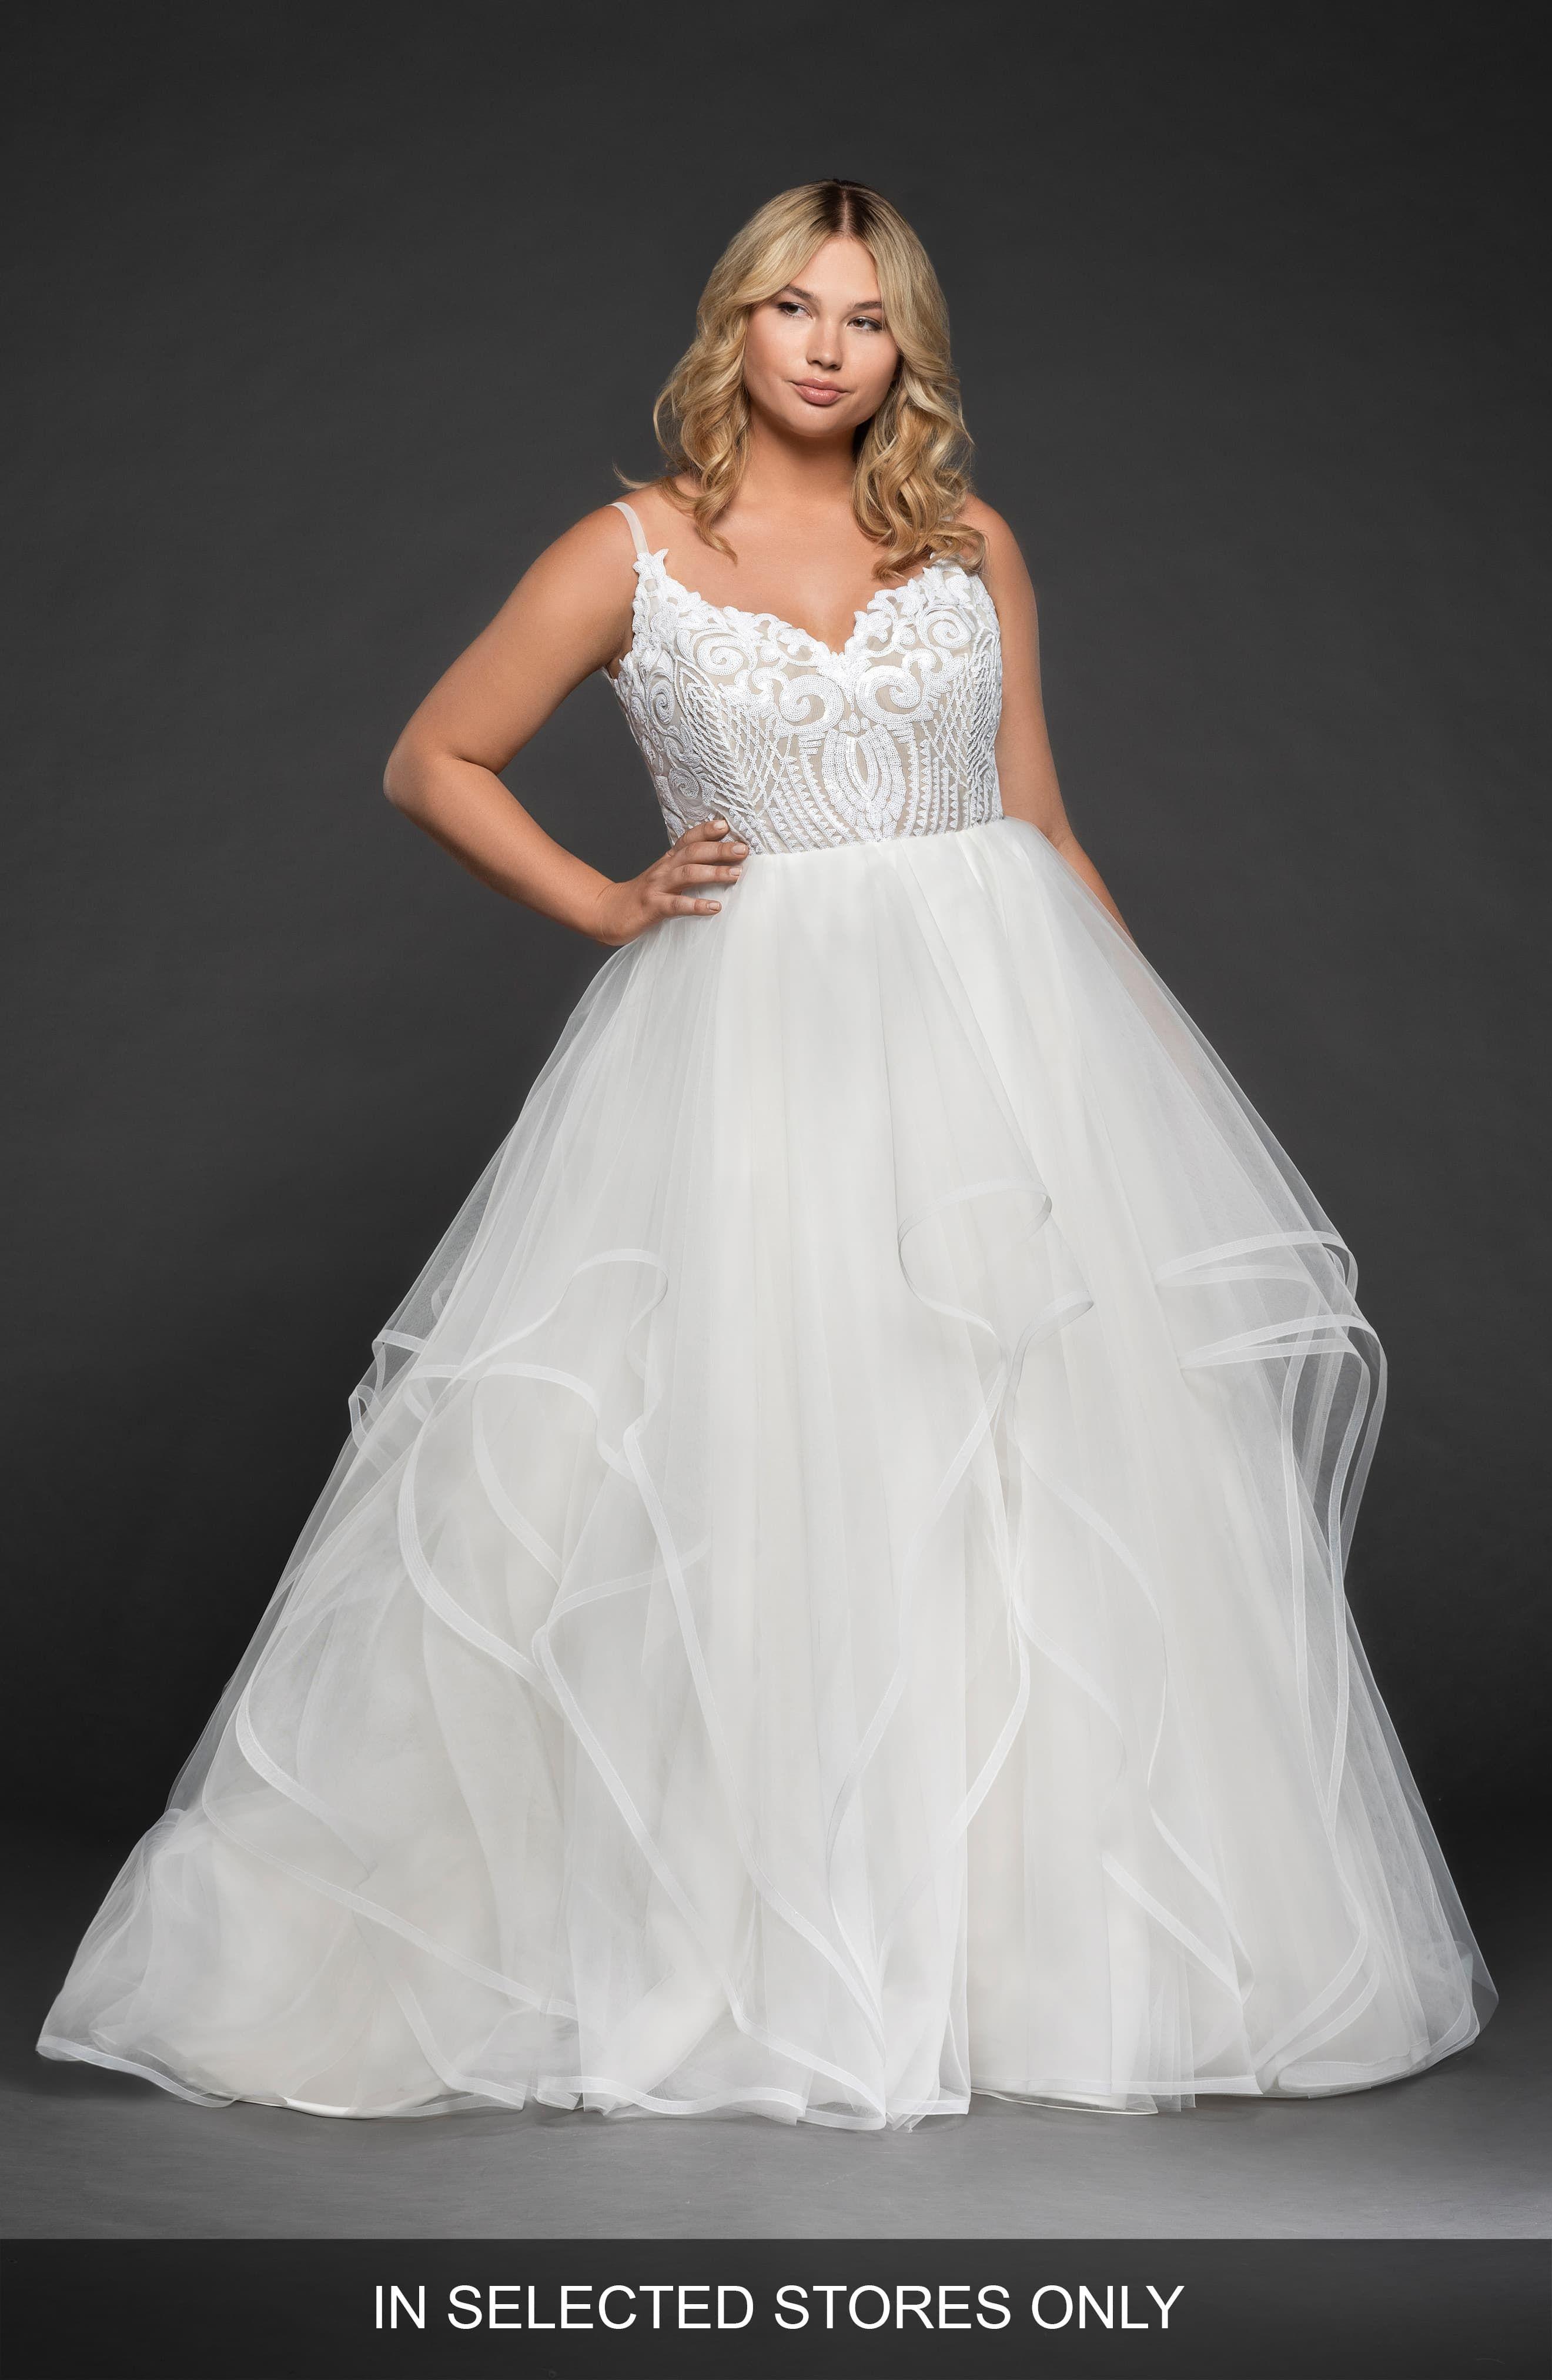 Blush By Hayley Paige Pepper Ballgown Wedding Dress Plus Size Nordstrom Plus Size Wedding Gowns Wedding Dresses Plus Size Blush By Hayley Paige [ 4048 x 2640 Pixel ]